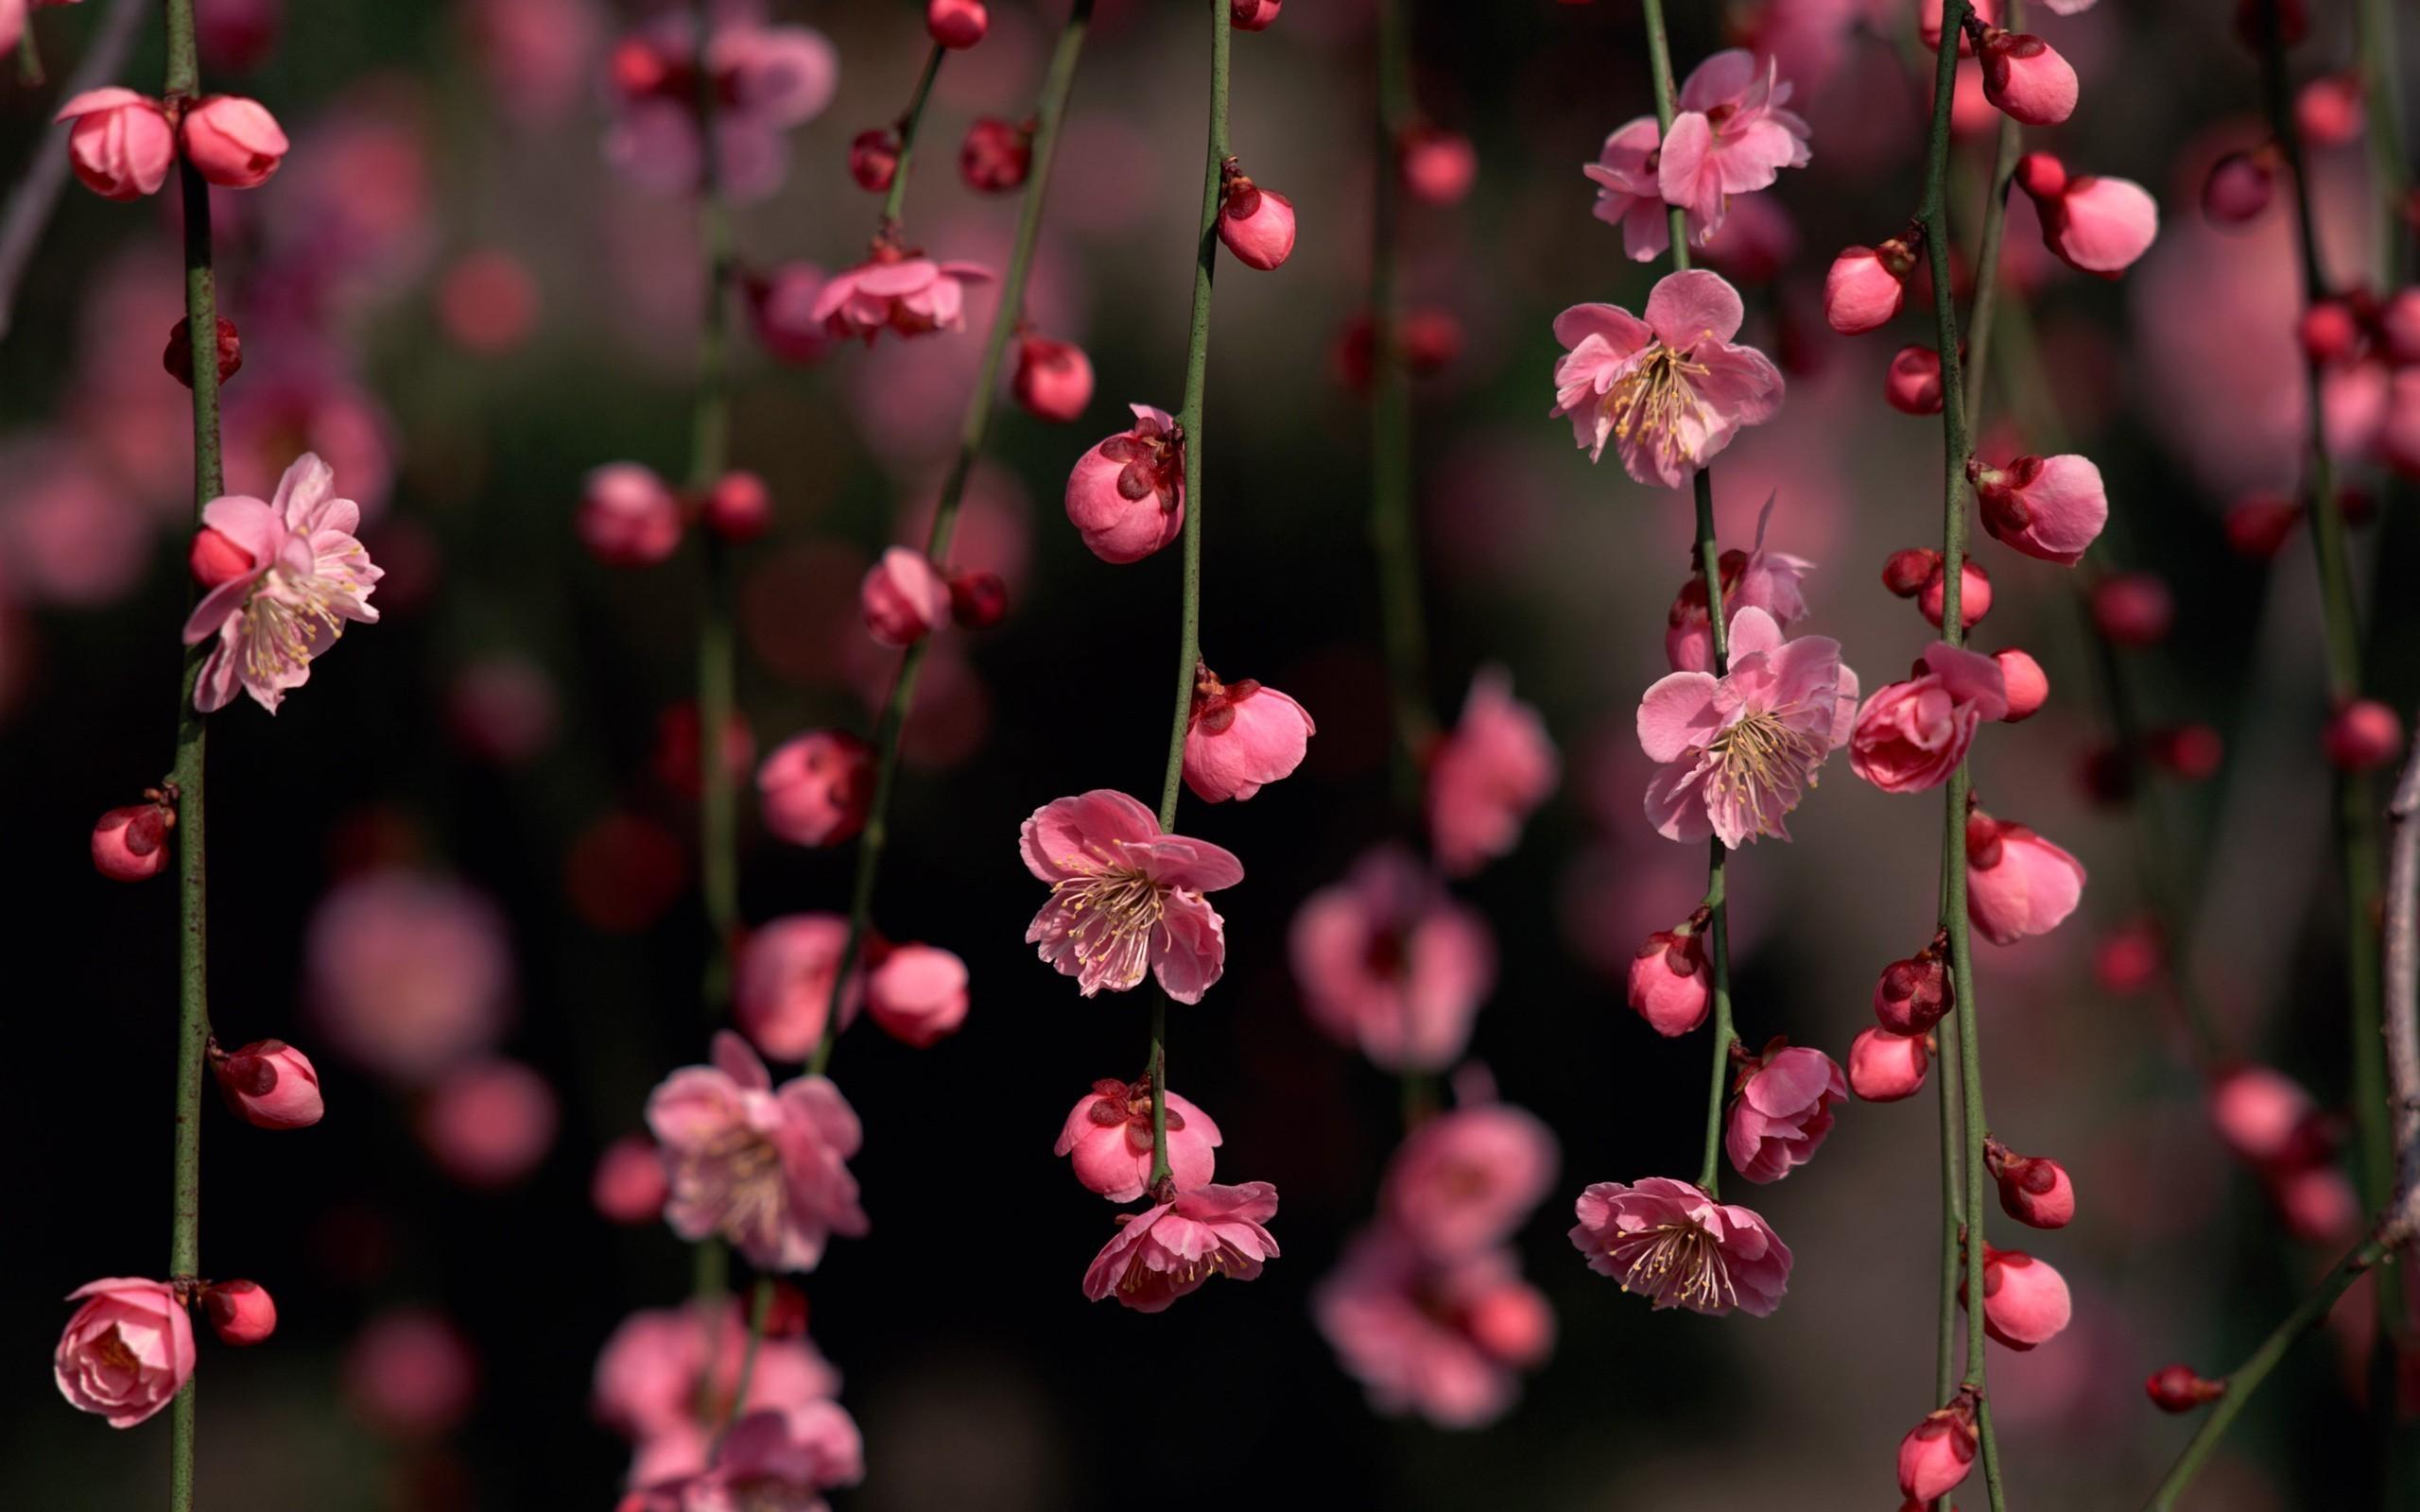 Cherry blossoms wallpaper #15322